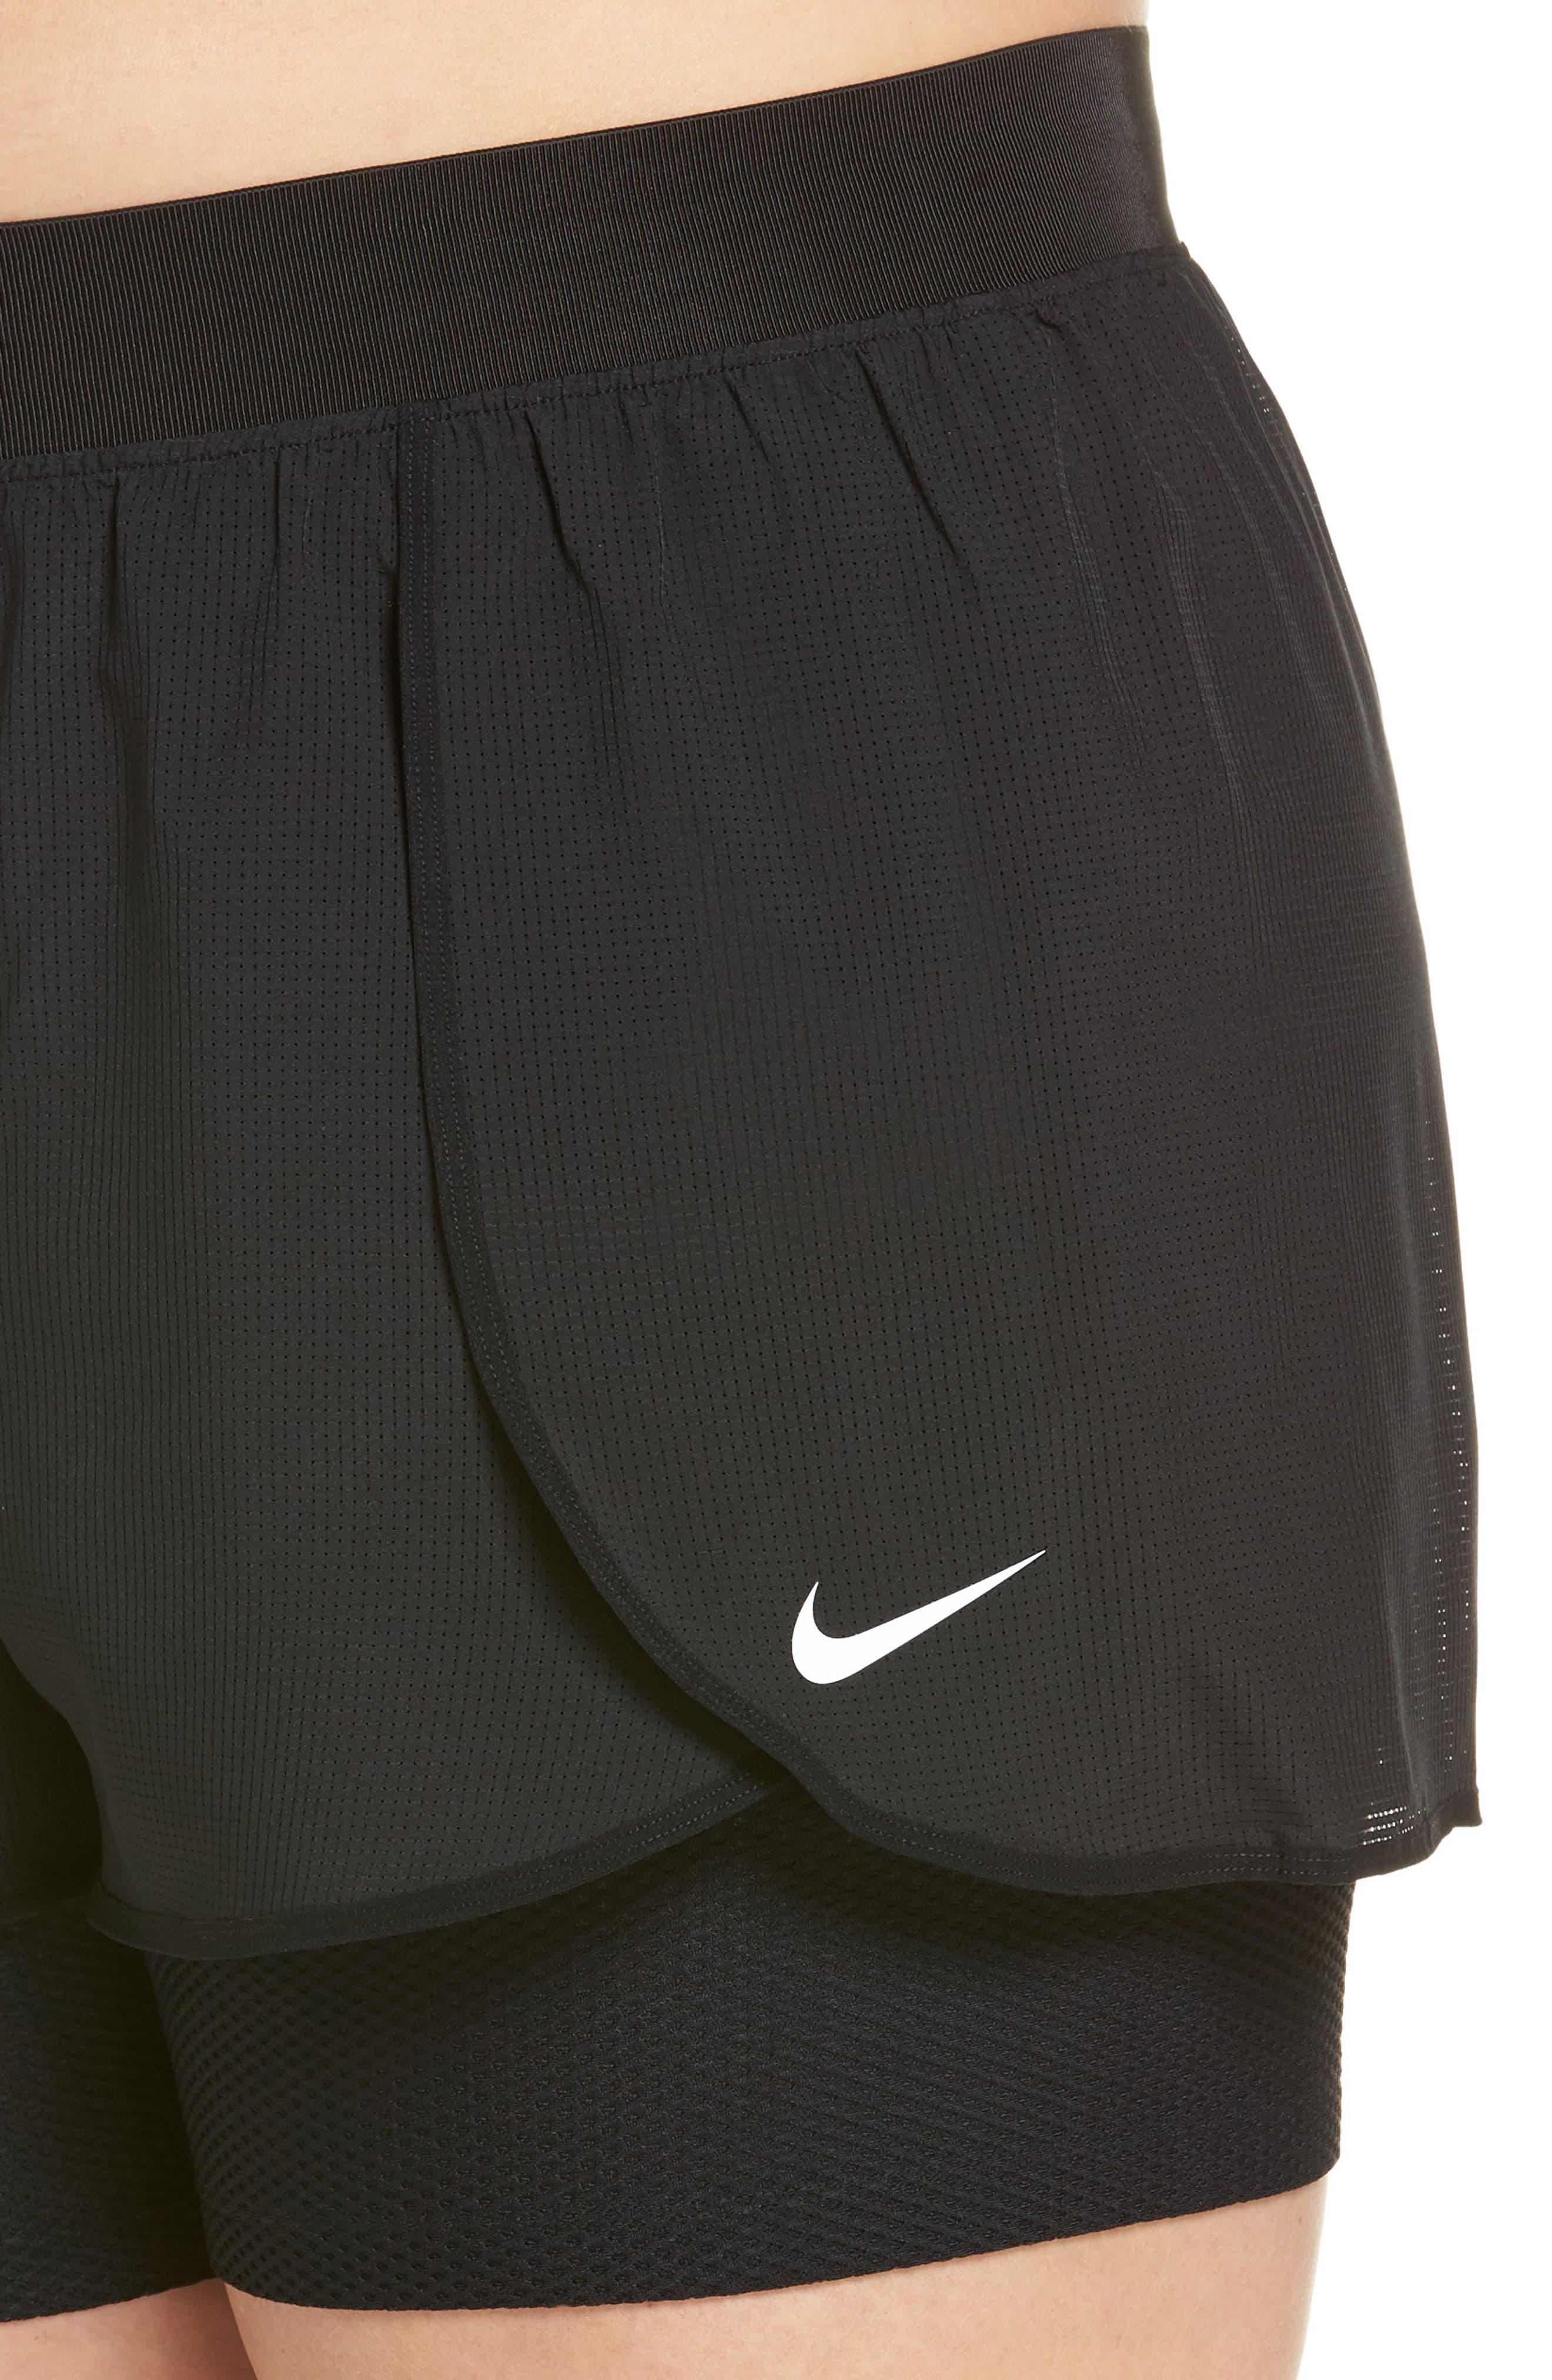 NIKE,                             Flex Bliss 2-in-1 Training Shorts,                             Alternate thumbnail 4, color,                             010